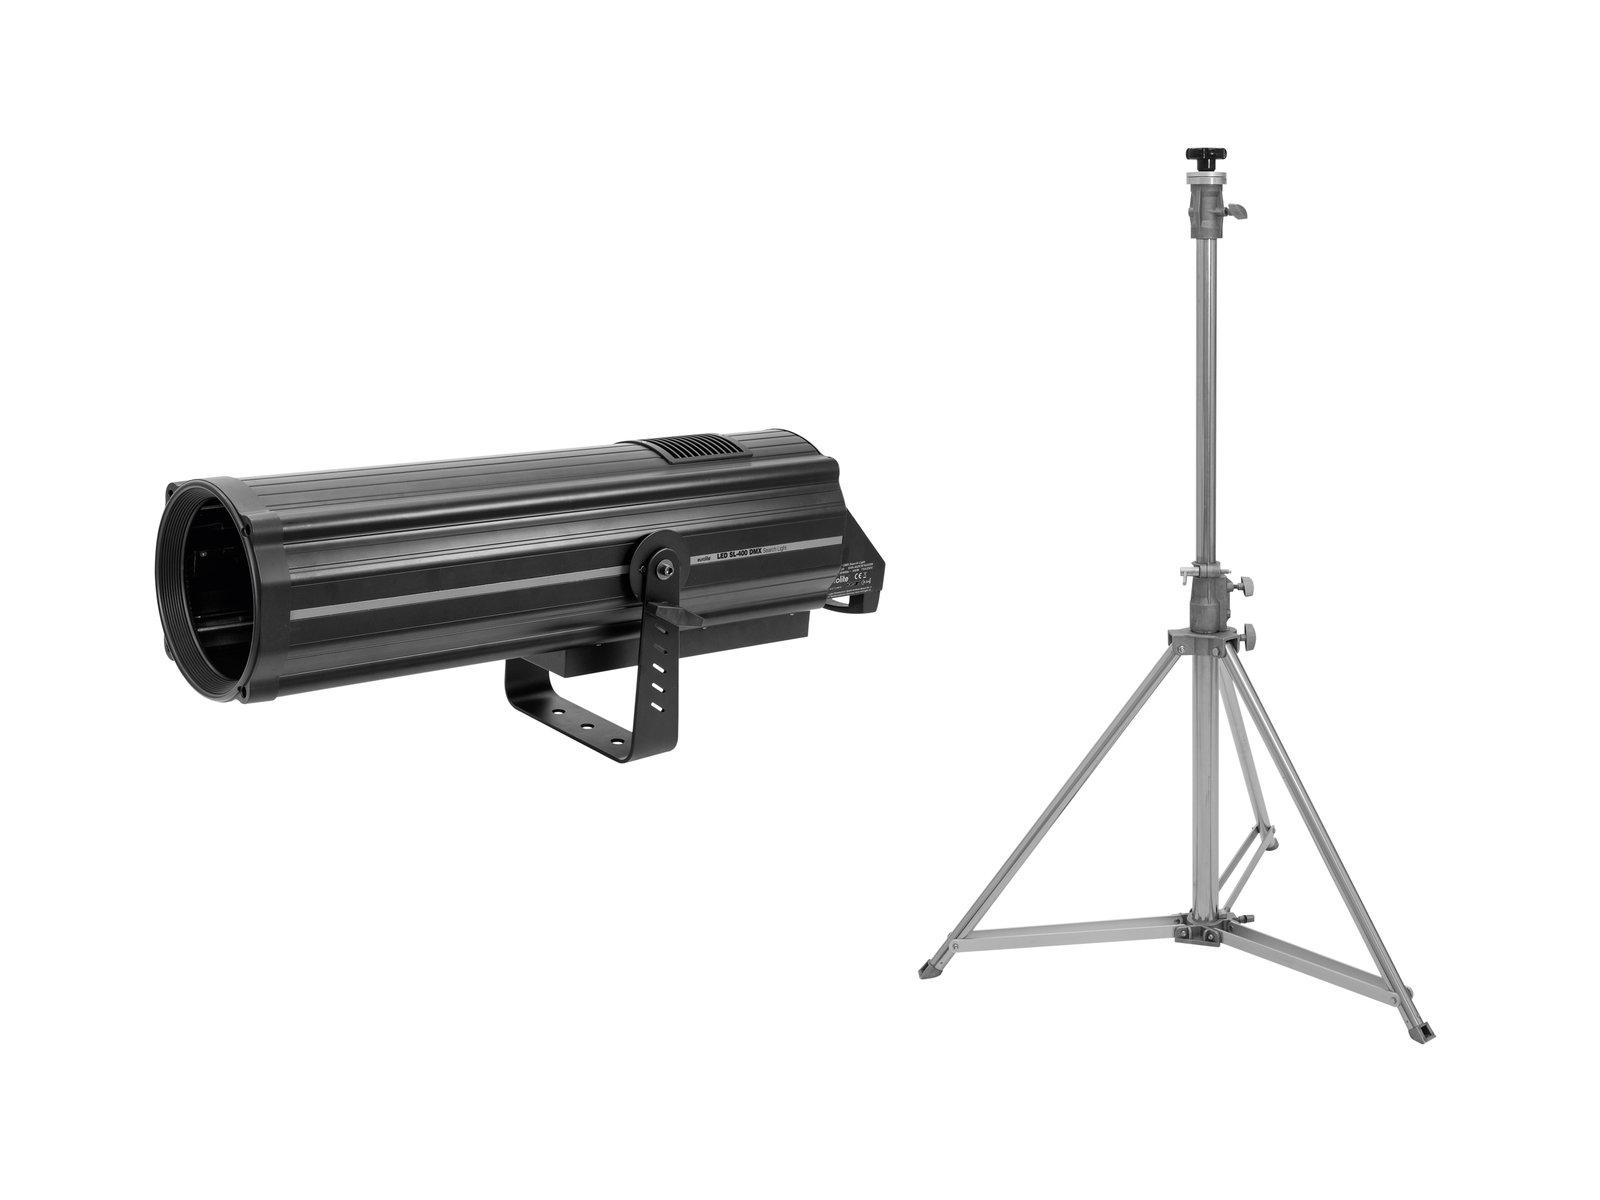 Eurolite LED SL-400 DMX a stativ STV-200